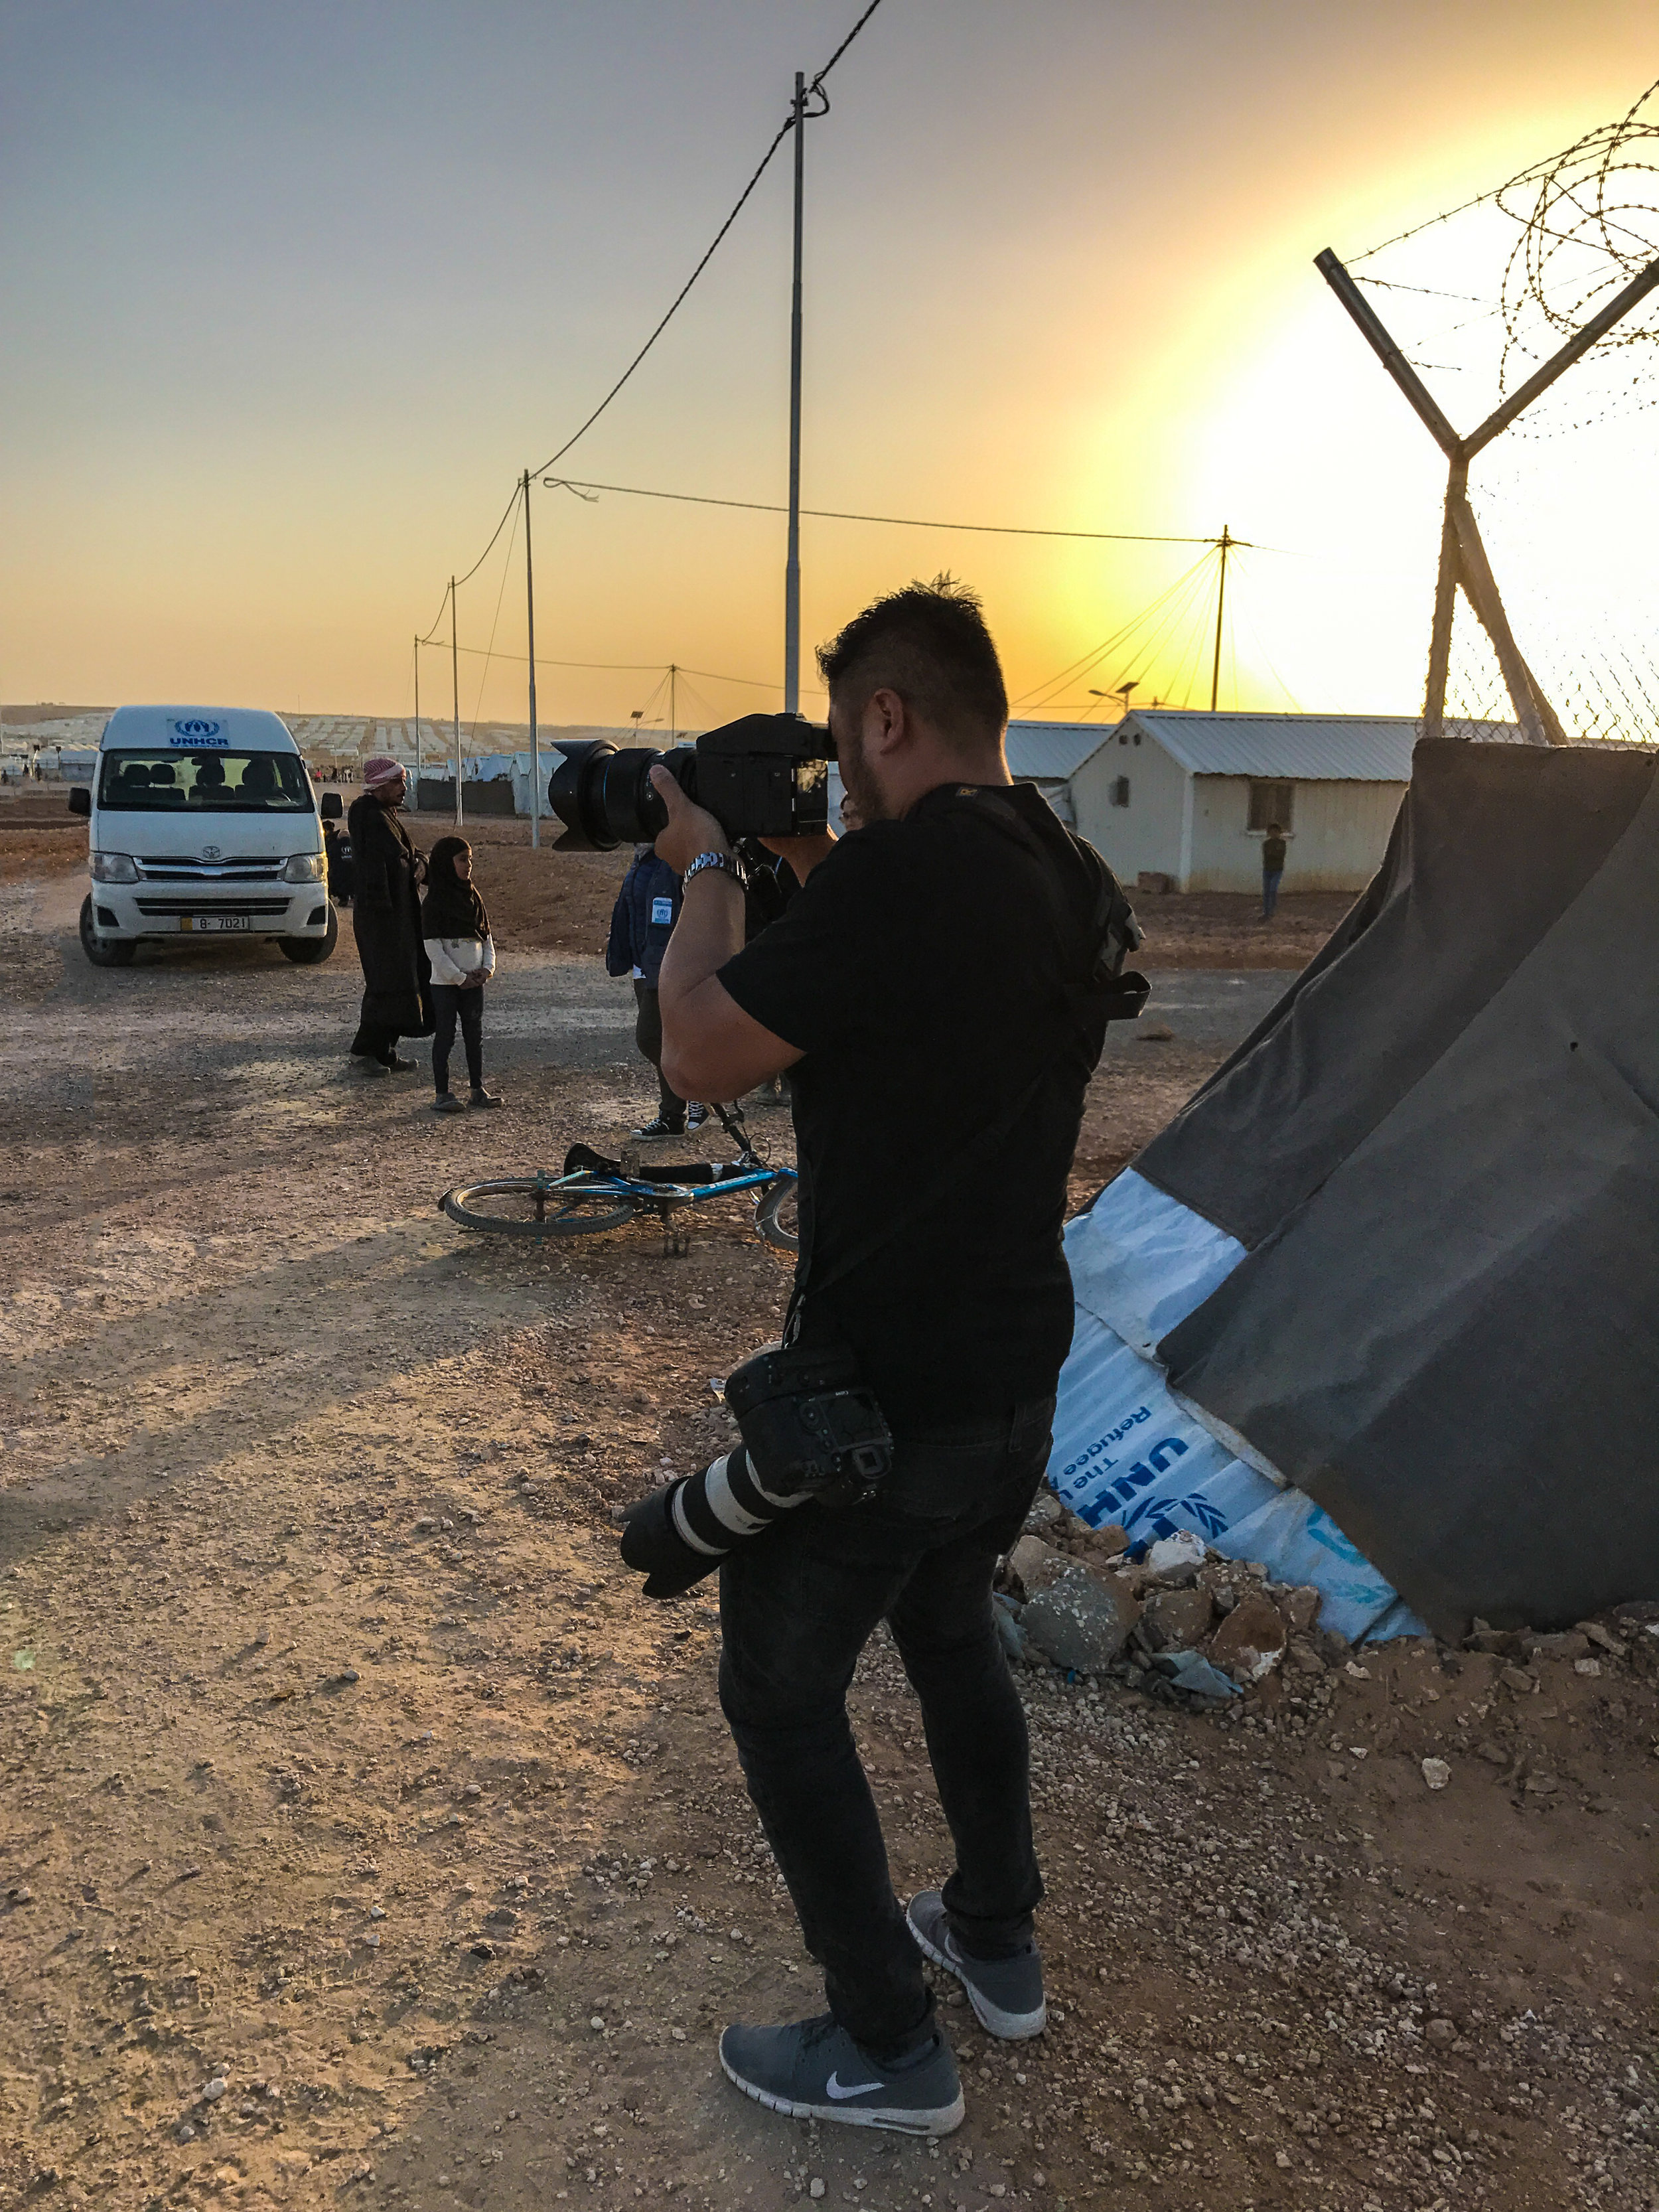 UNHCR AZRAQ REFUGEE CAMP, JORDAN